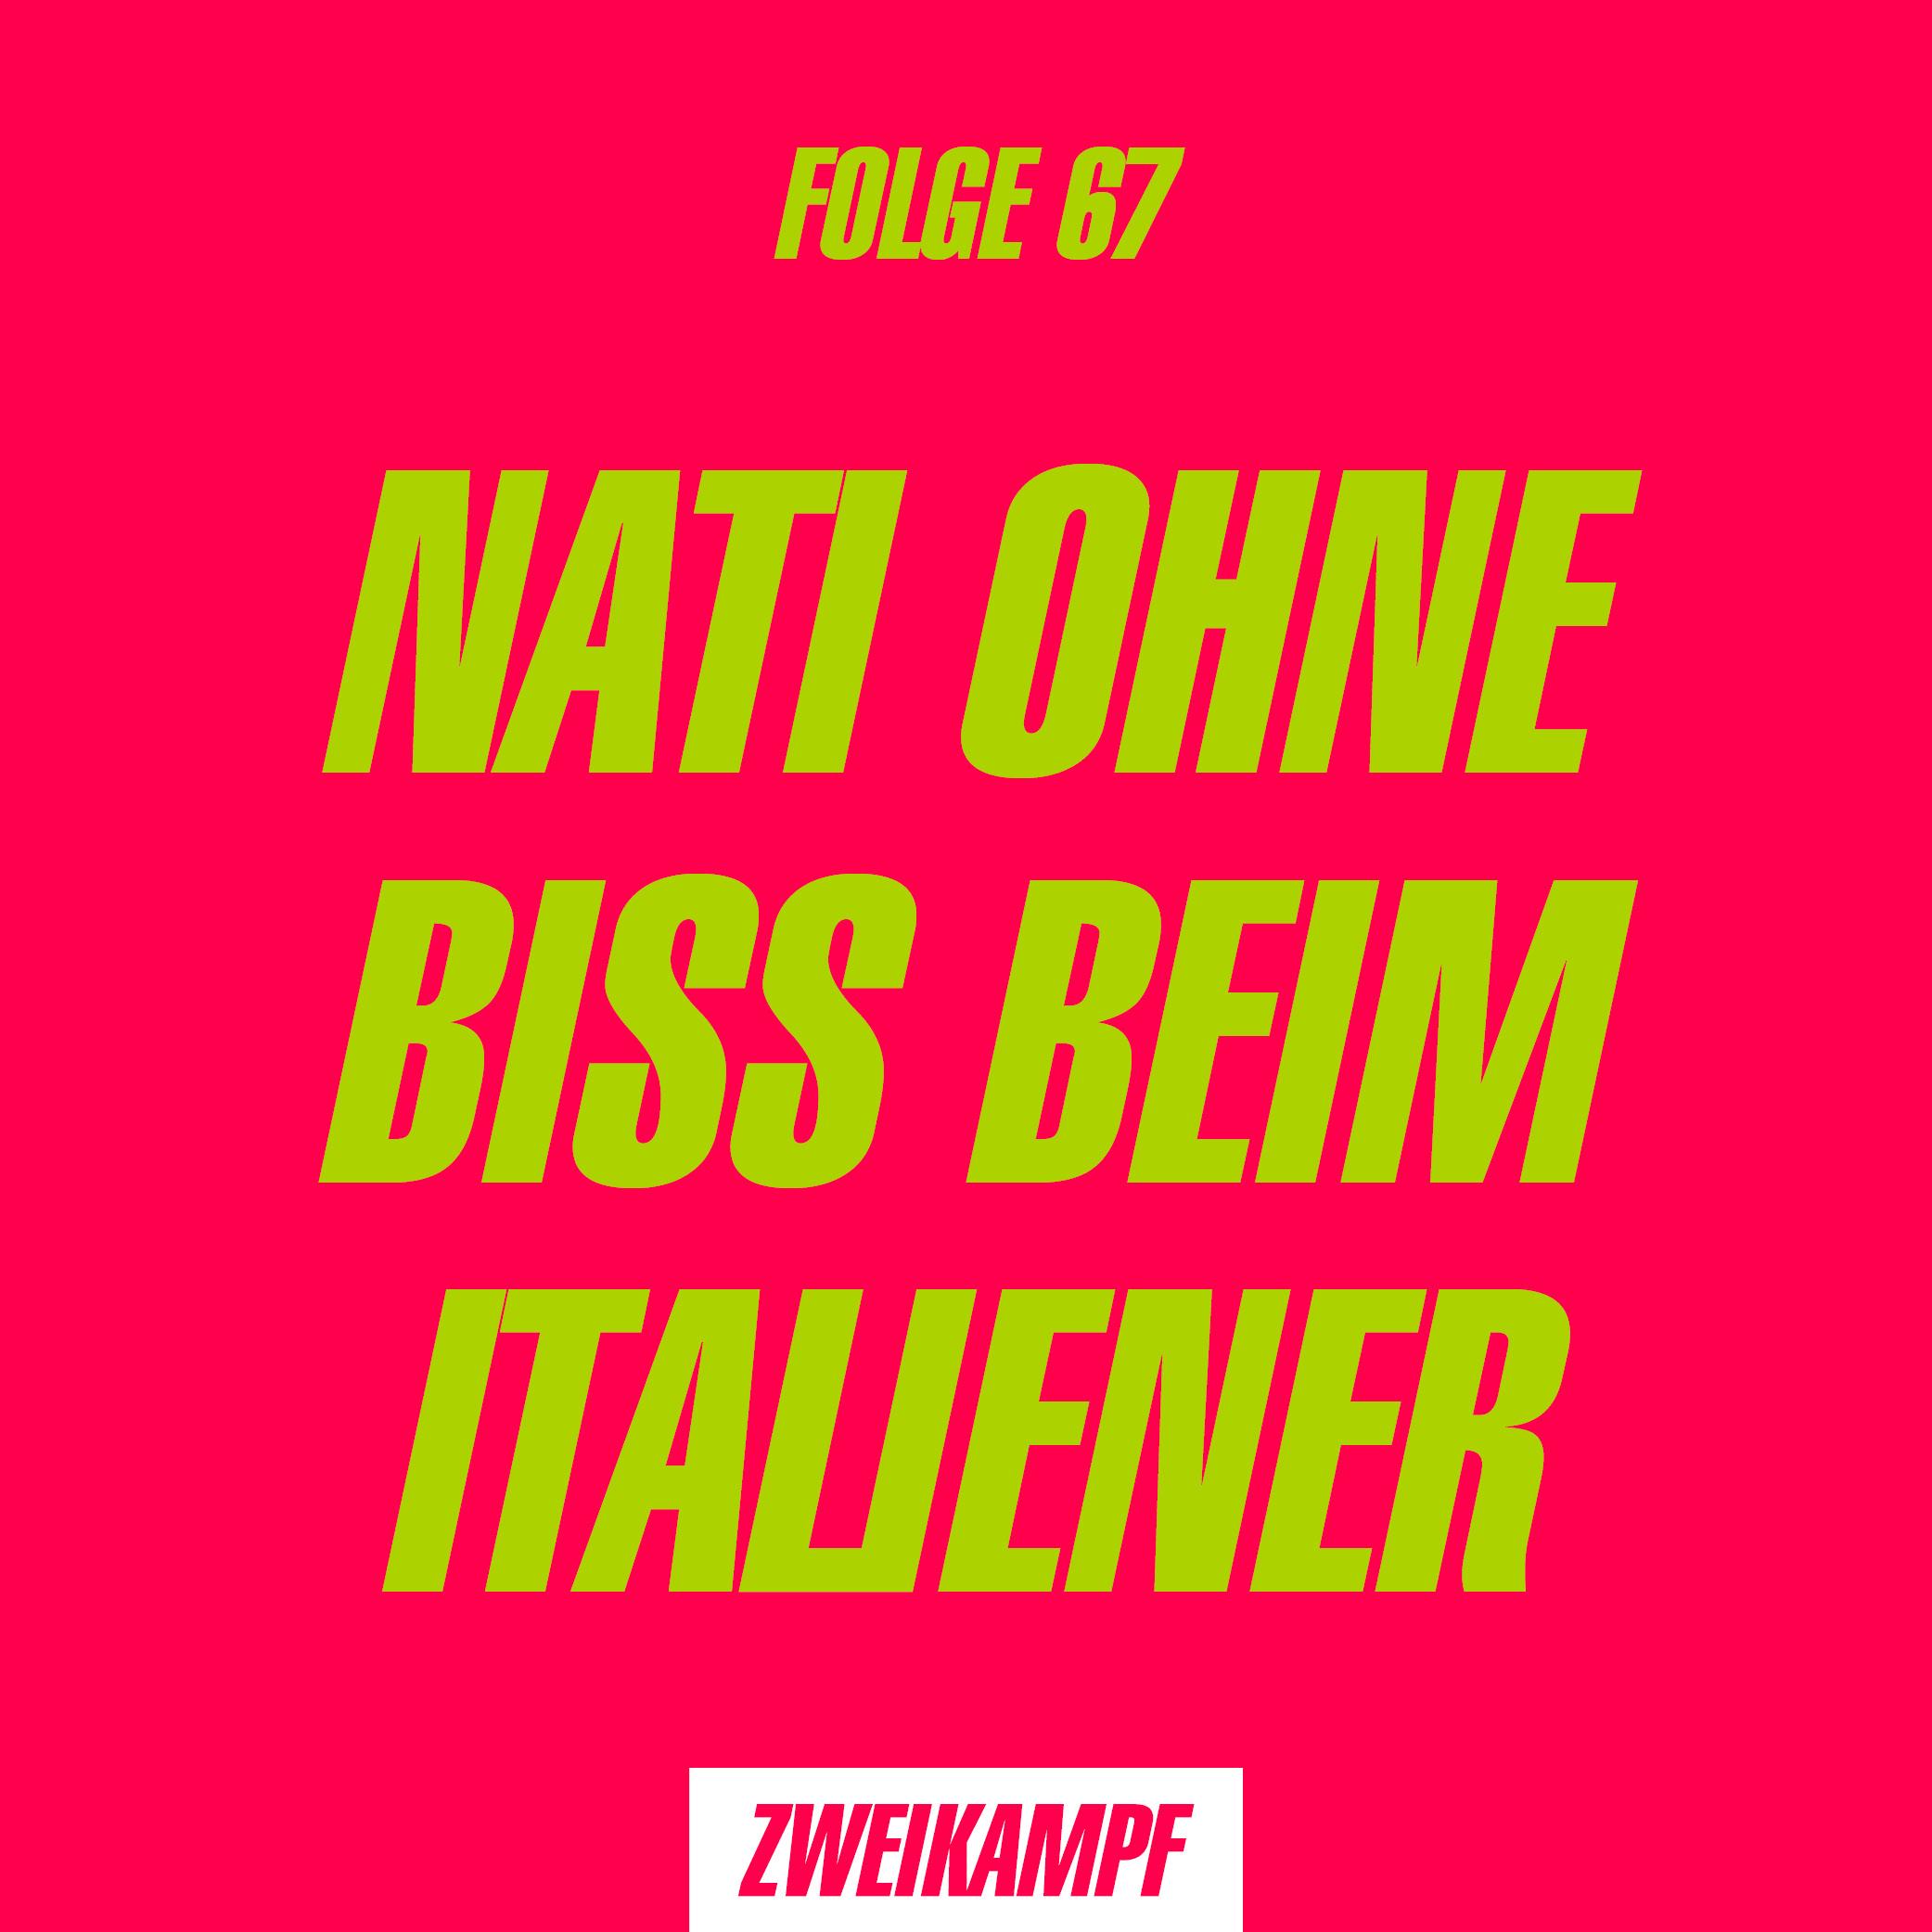 Folge 67: Nati ohne Biss beim Italiener